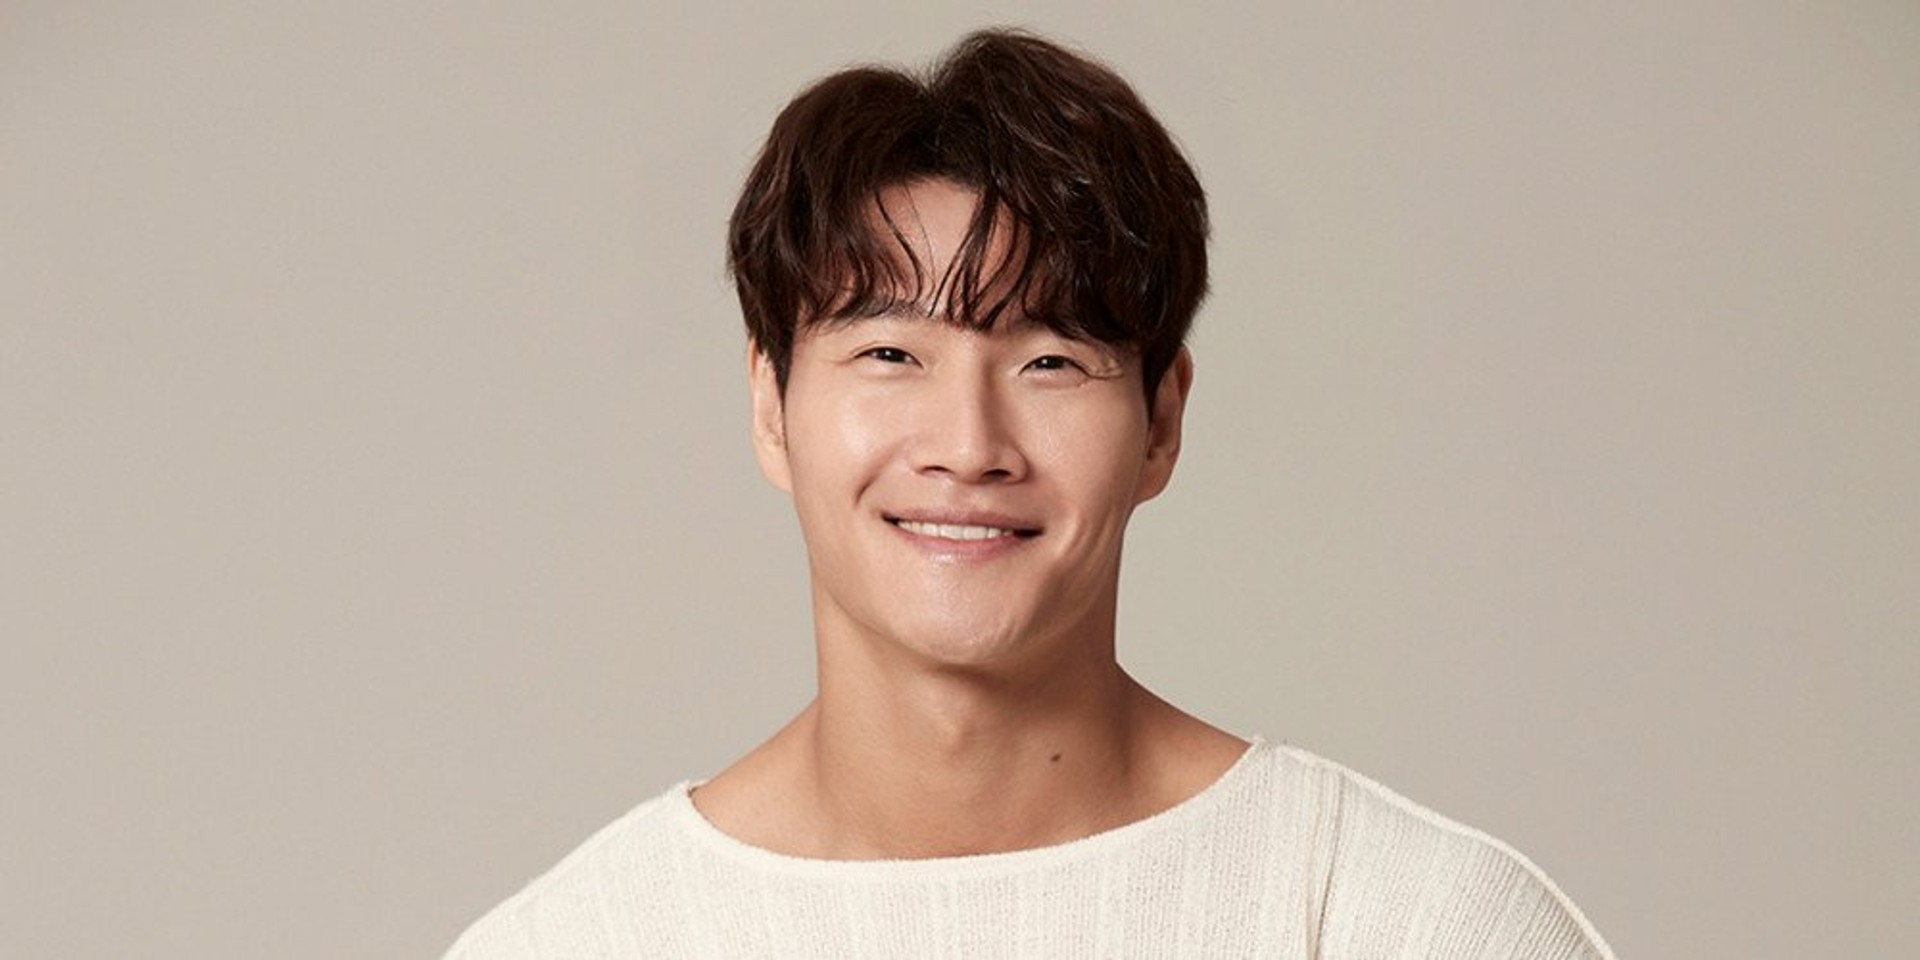 Kim Jong Kook releases 'Tear Thief' for 'Joseon's Ban on Marriage' series - listen